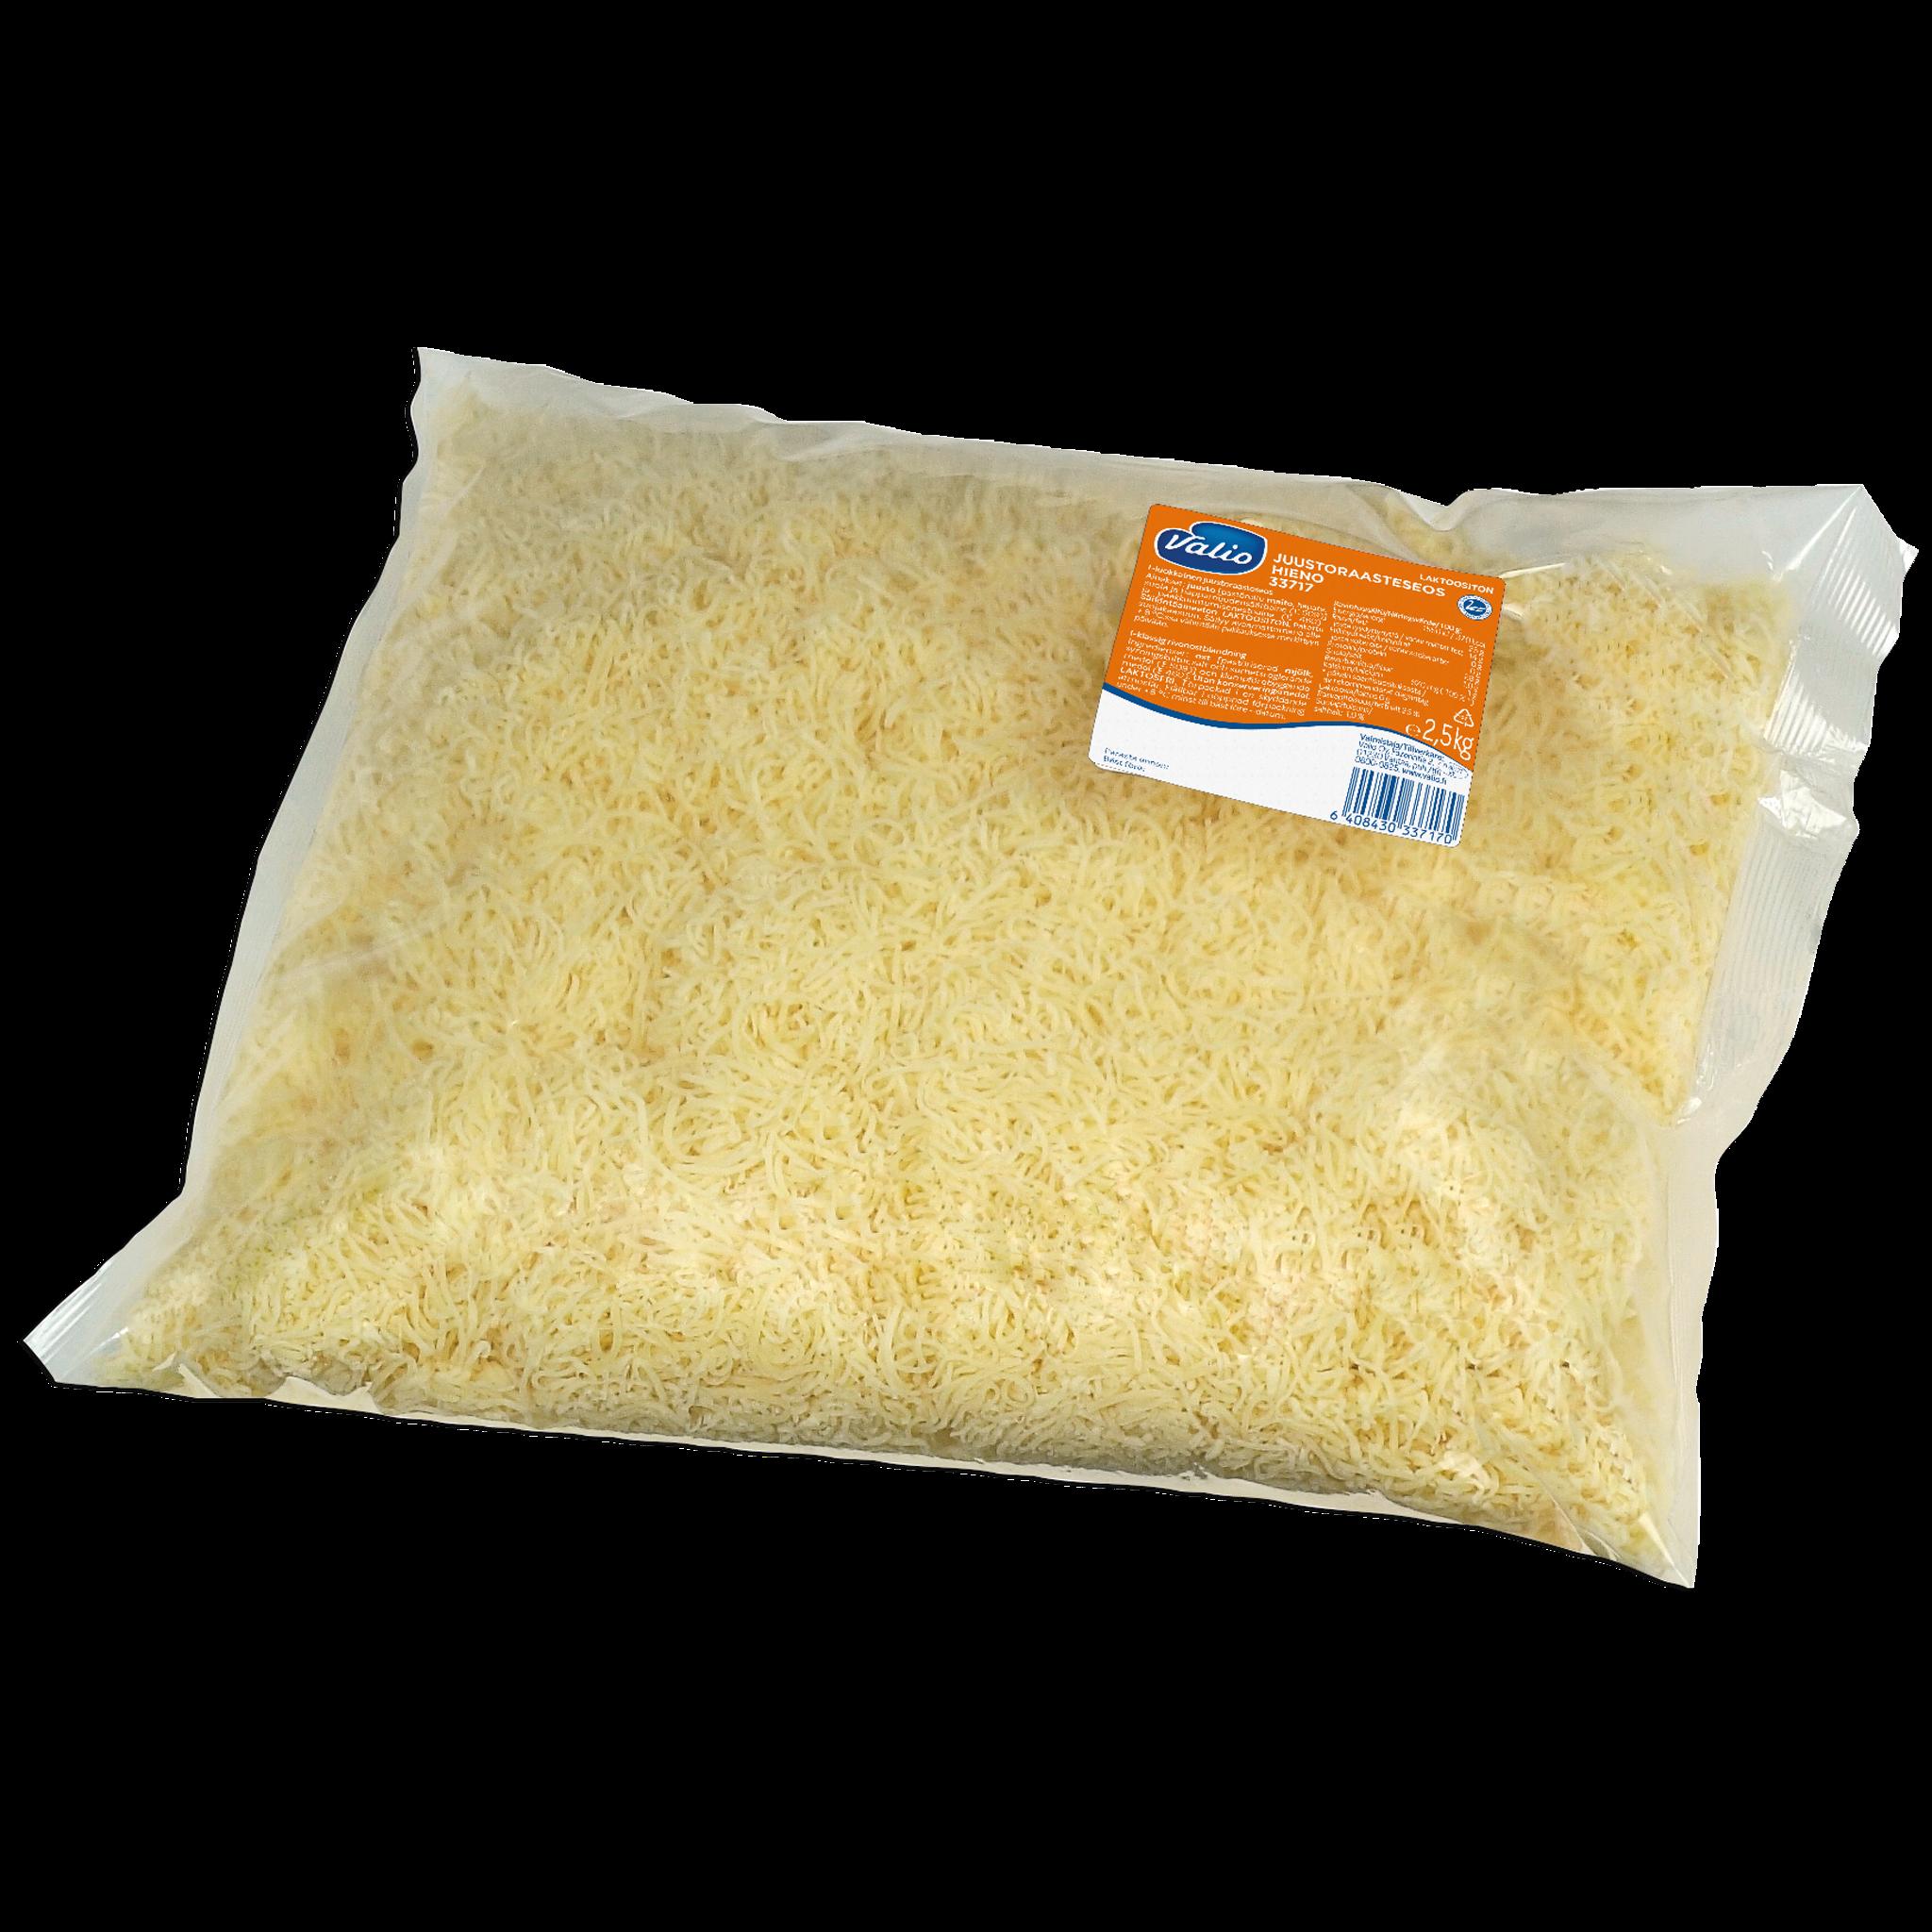 Valio juustoraasteseos hieno